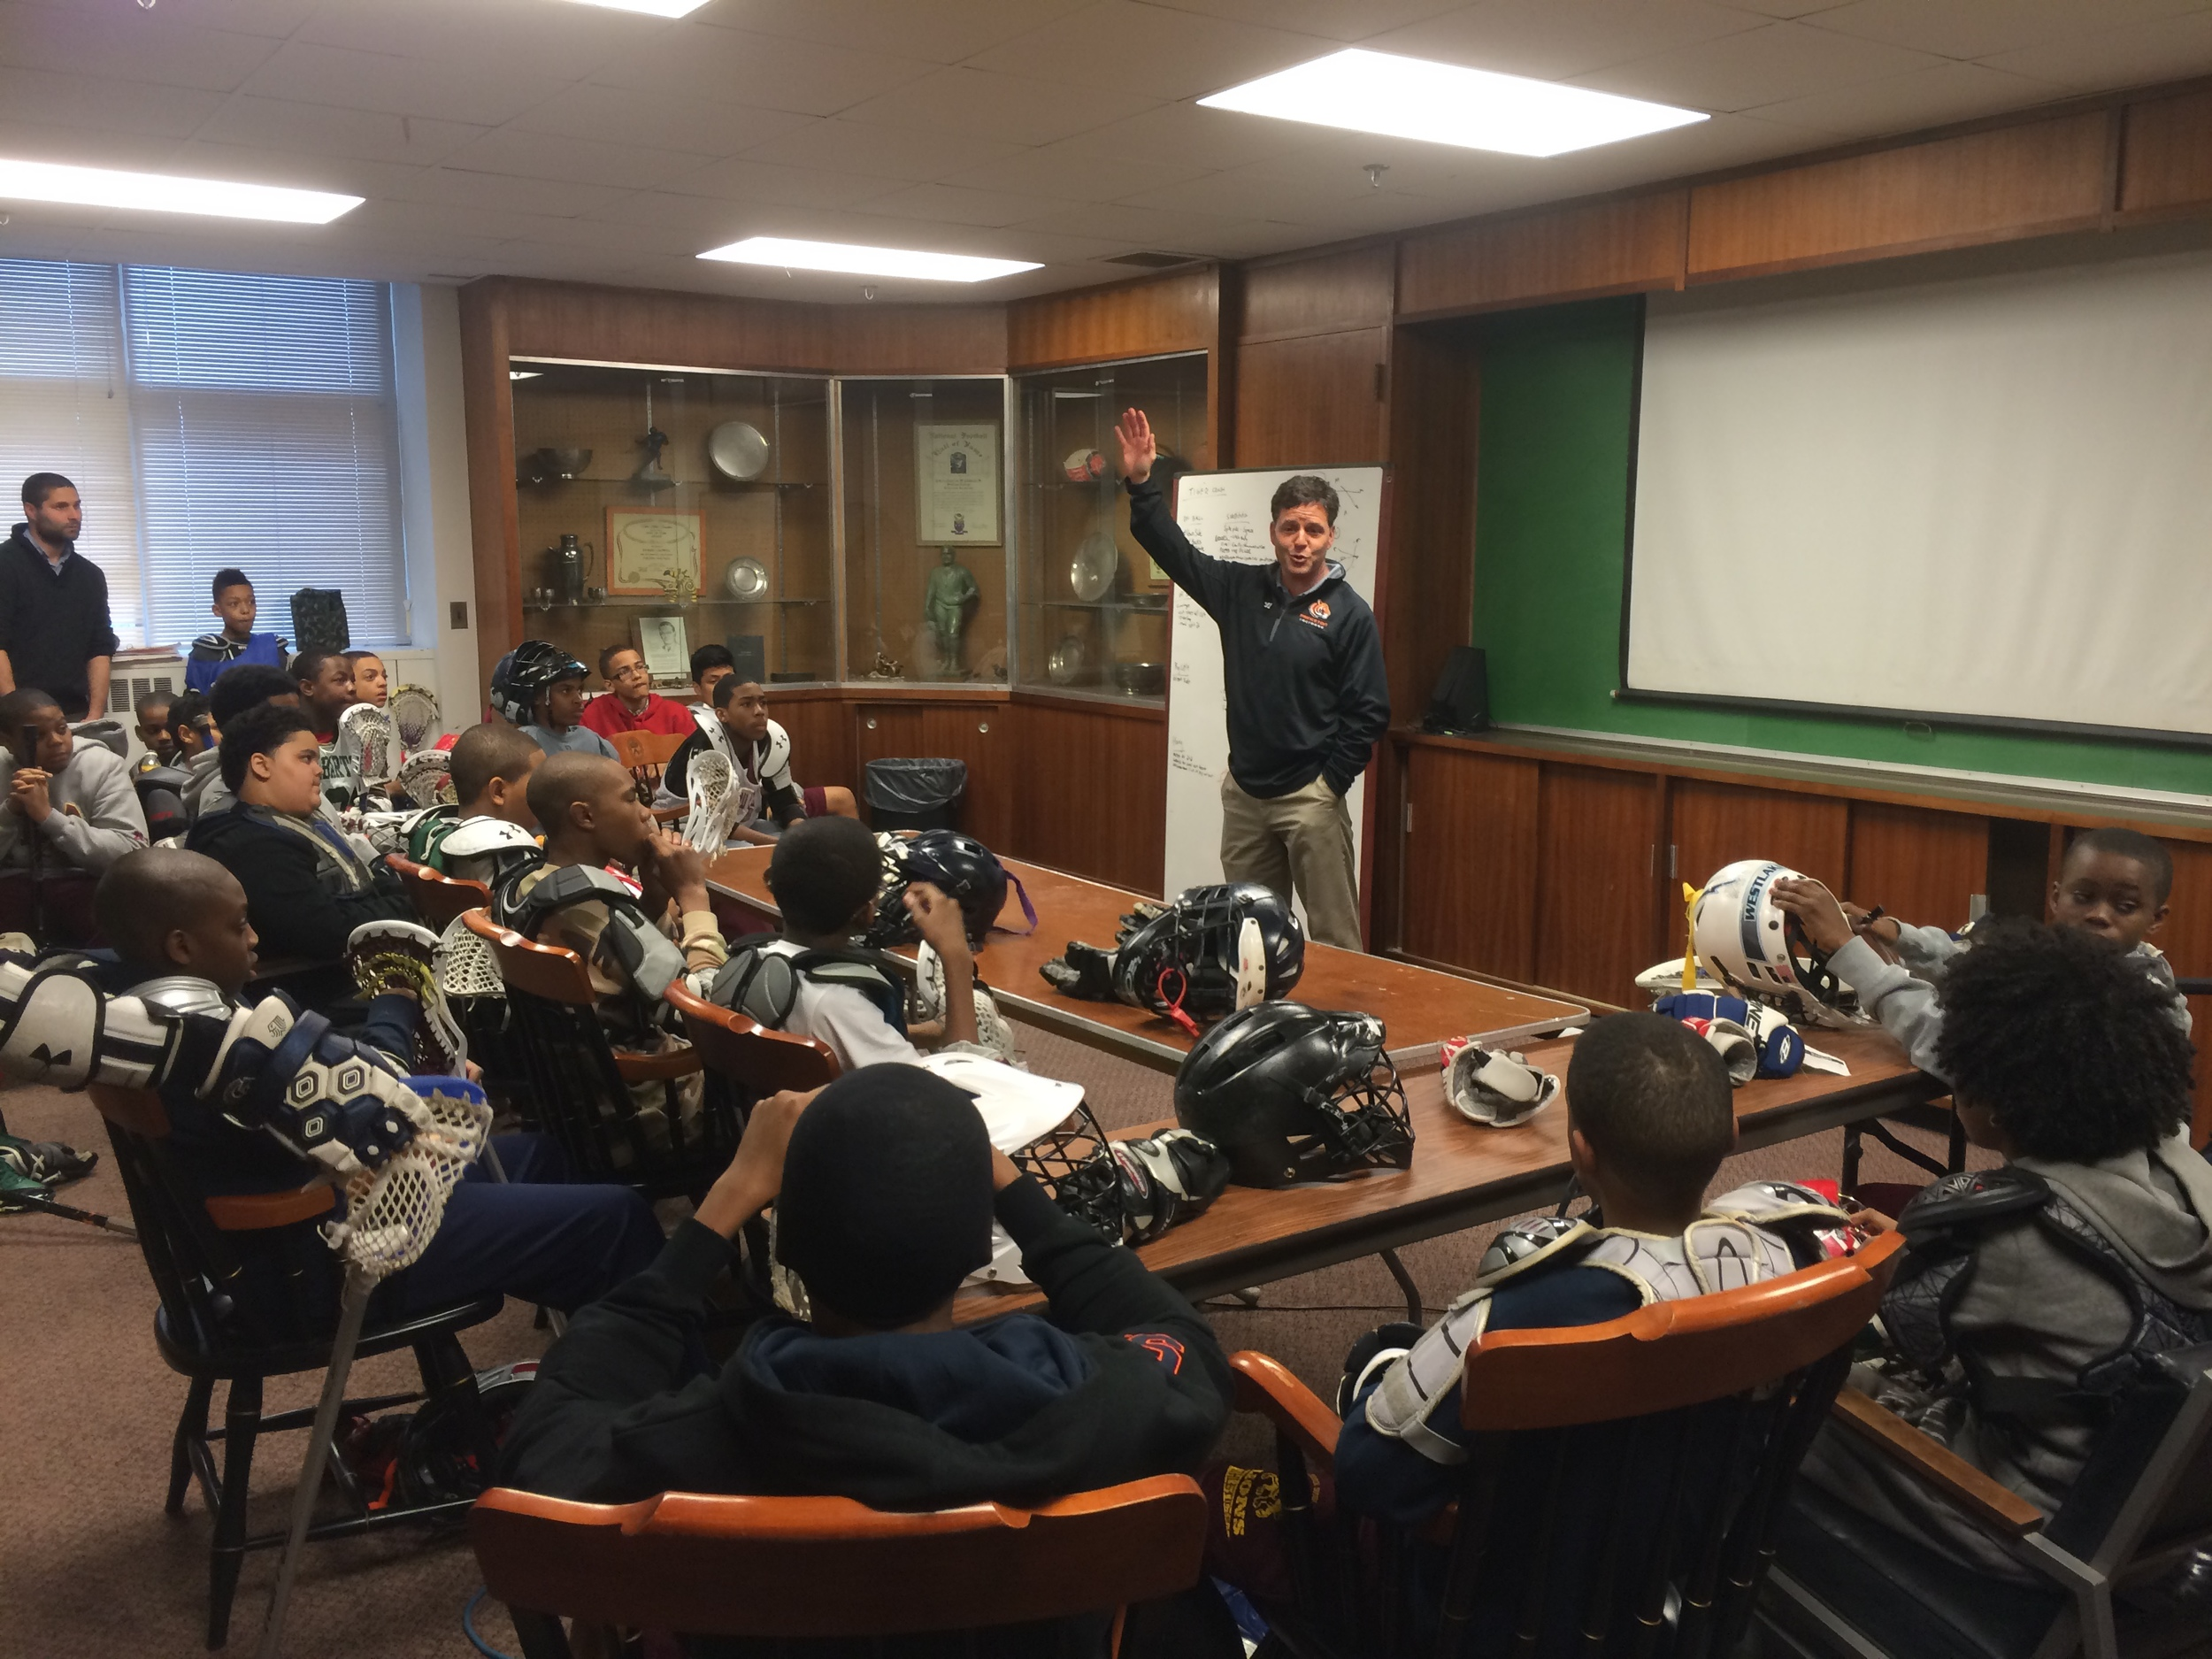 FDA Boys in Princeton 2015 Photo #17.JPG